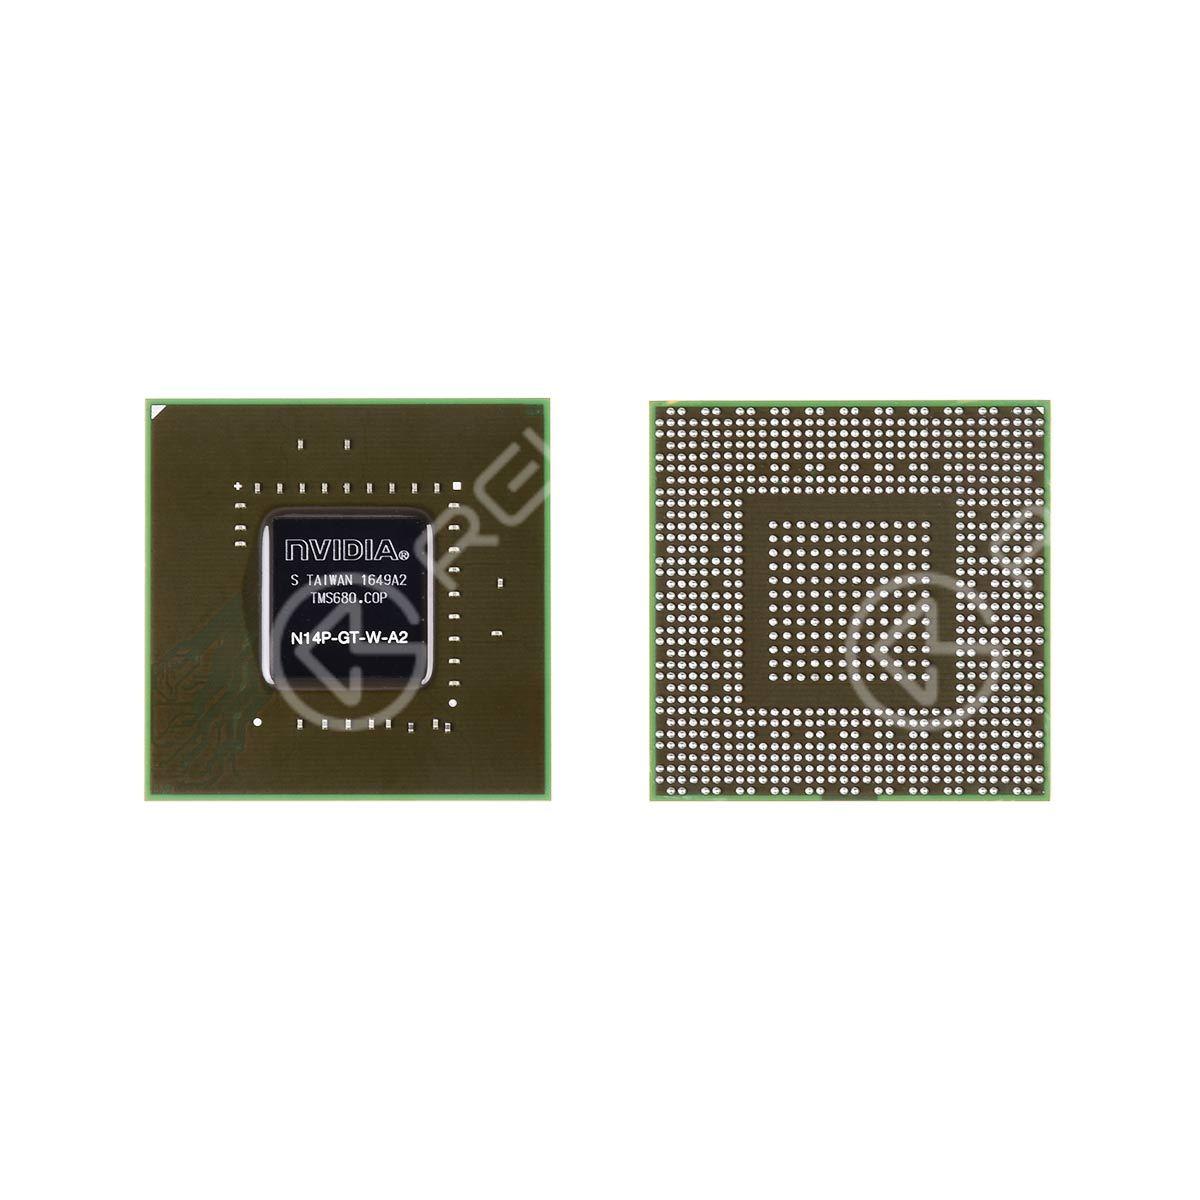 Nvidia GPU Graphic Chipset N14P-GT-W-A2 N14P